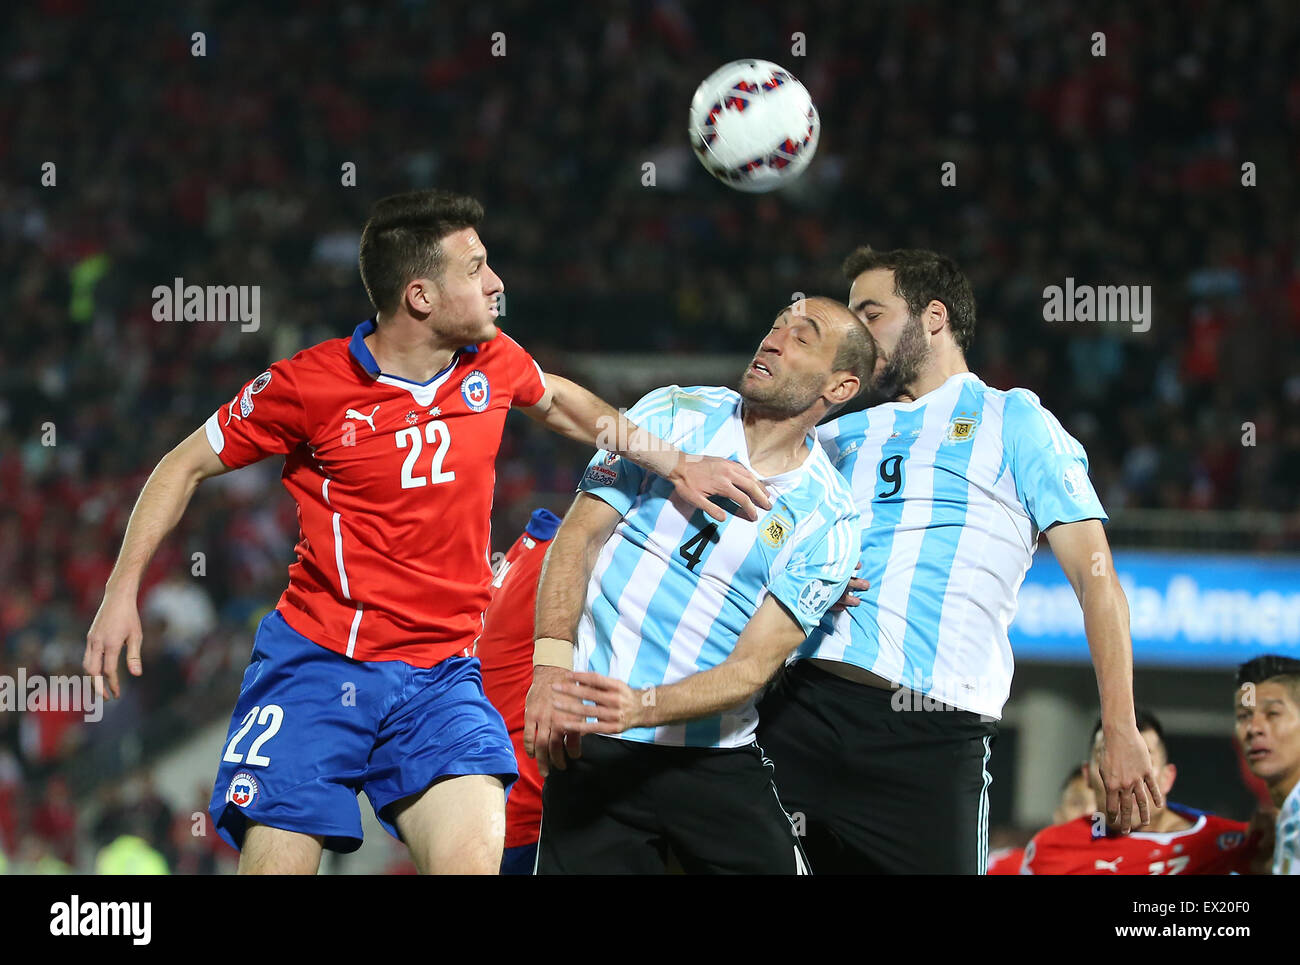 Santiago, Chile. 4 de julio de 2015. Chile Angelo Henriquez (L) vies con el argentino Pablo Zabaleta (C) y Gonzalo Imagen De Stock